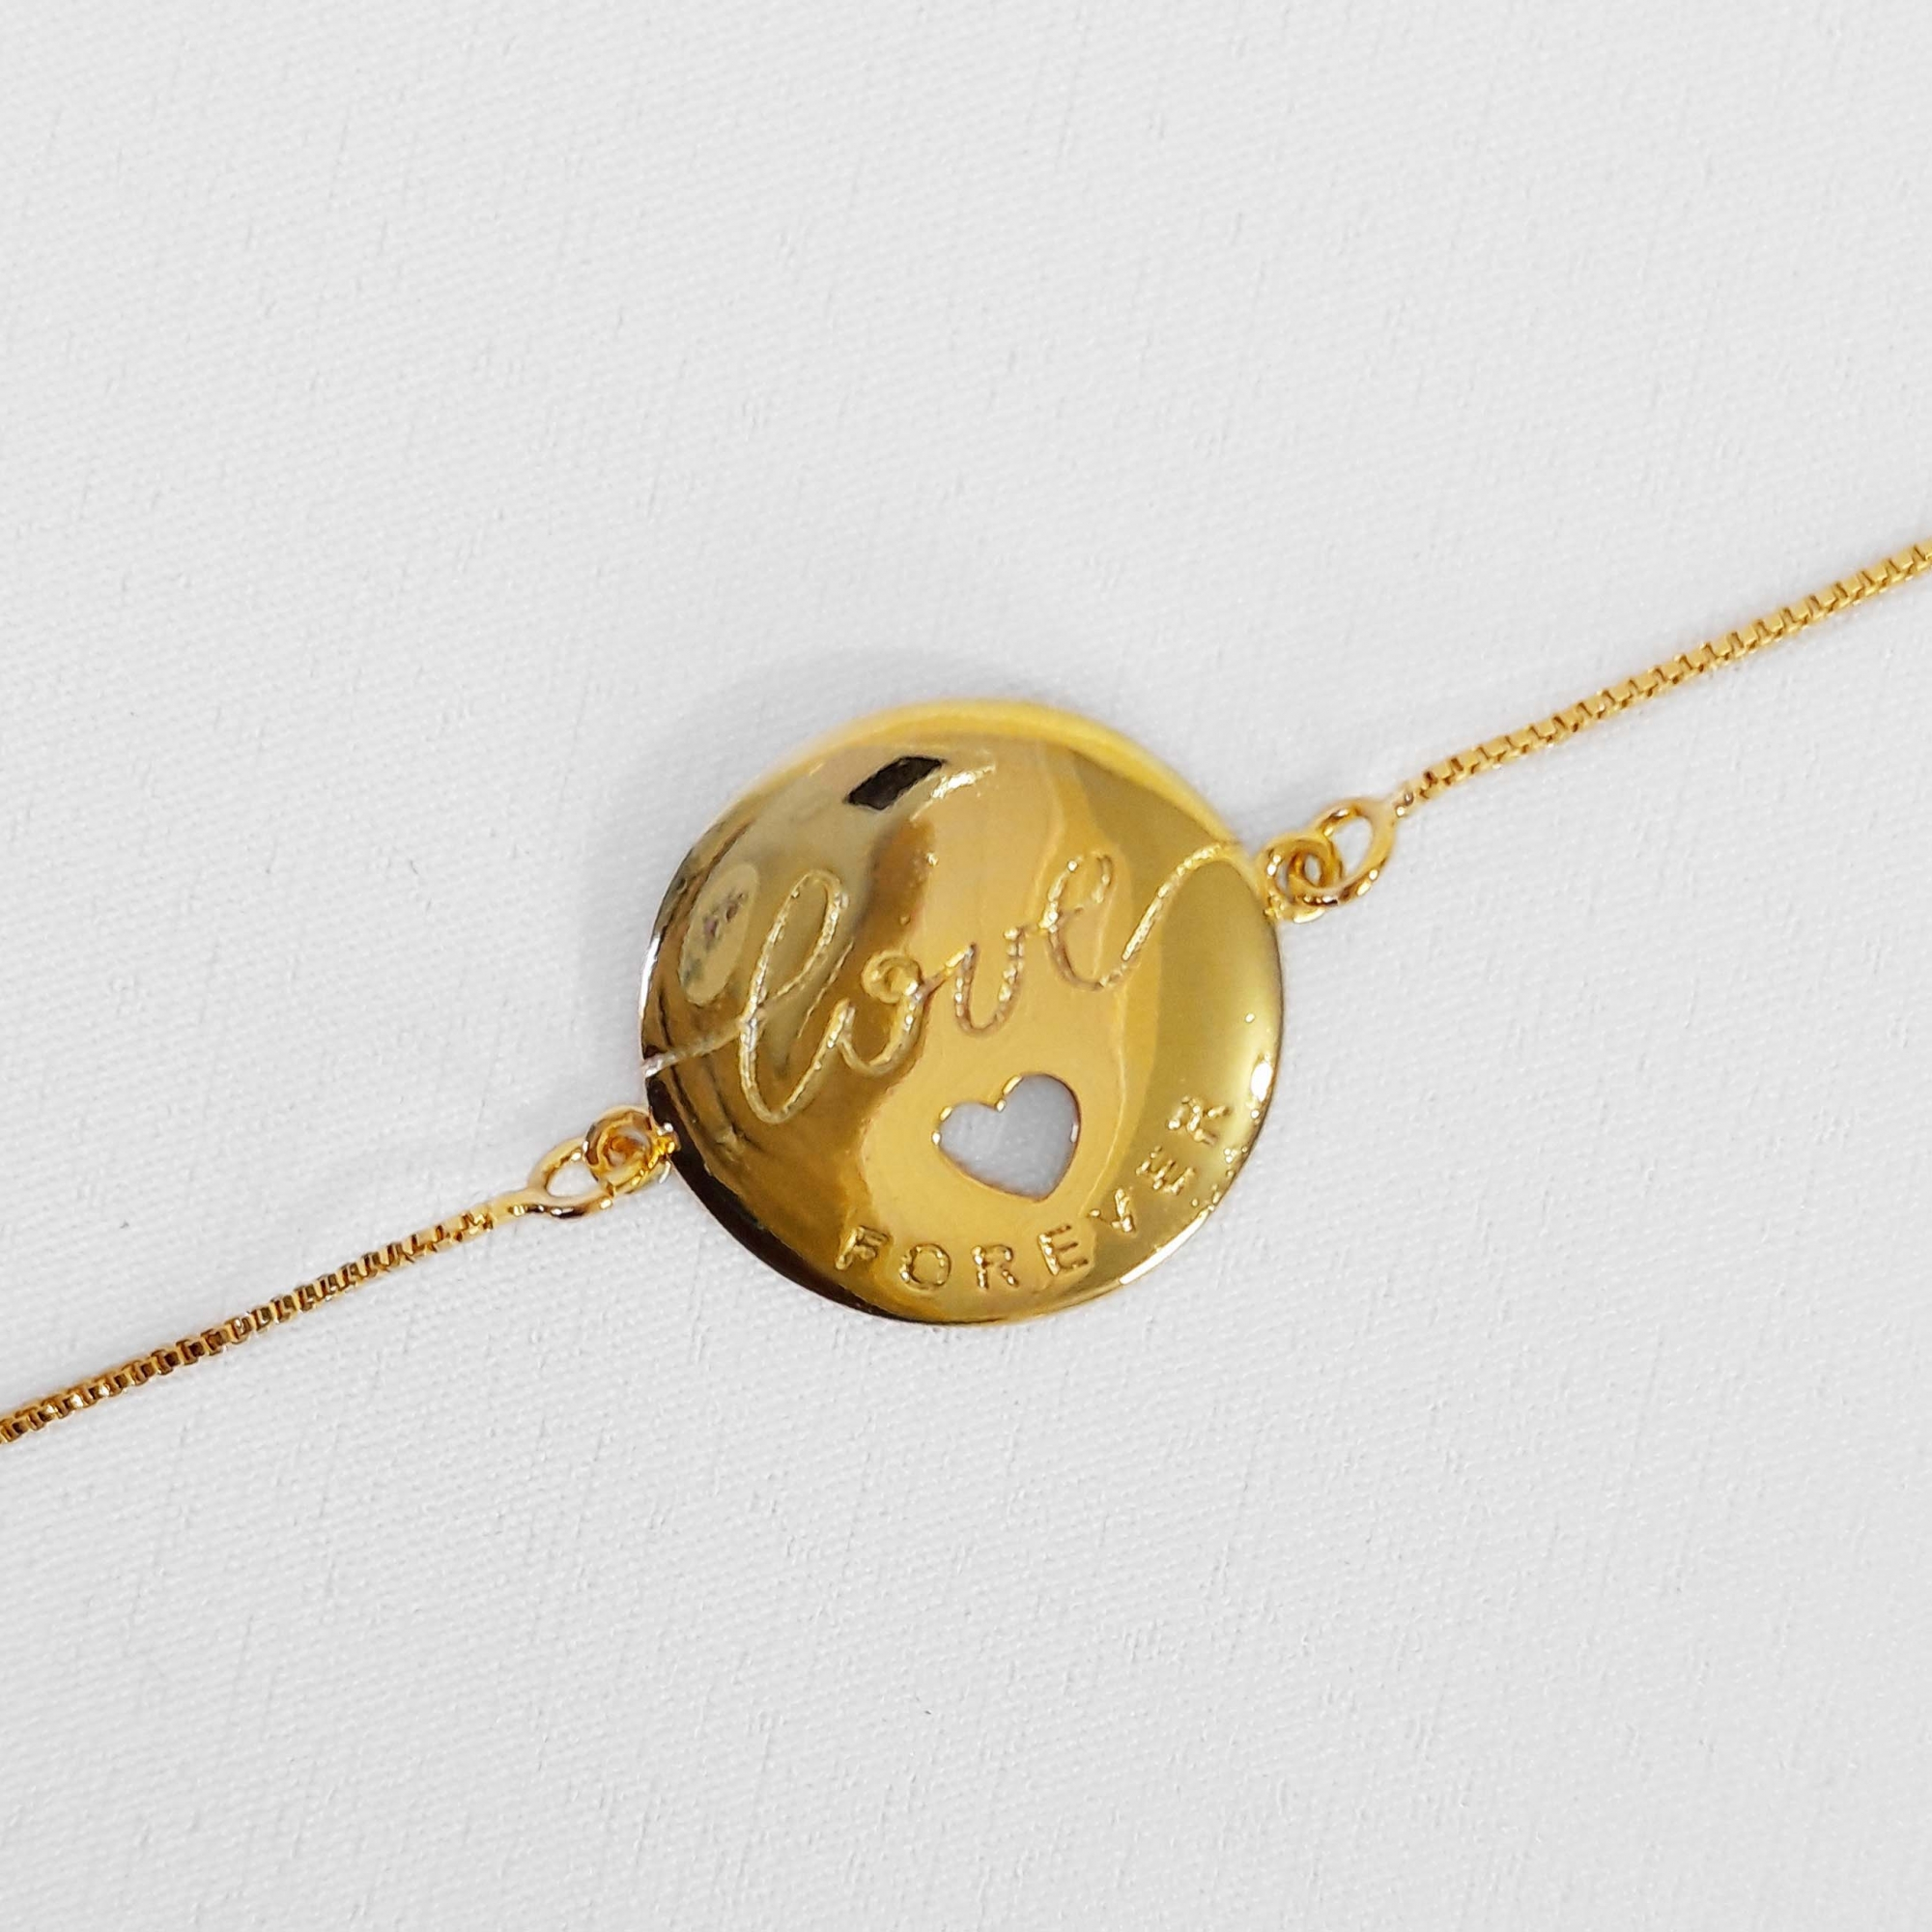 Pulseira Medalha Love Forever Folheada a Ouro 18k  - Lunozê Joias